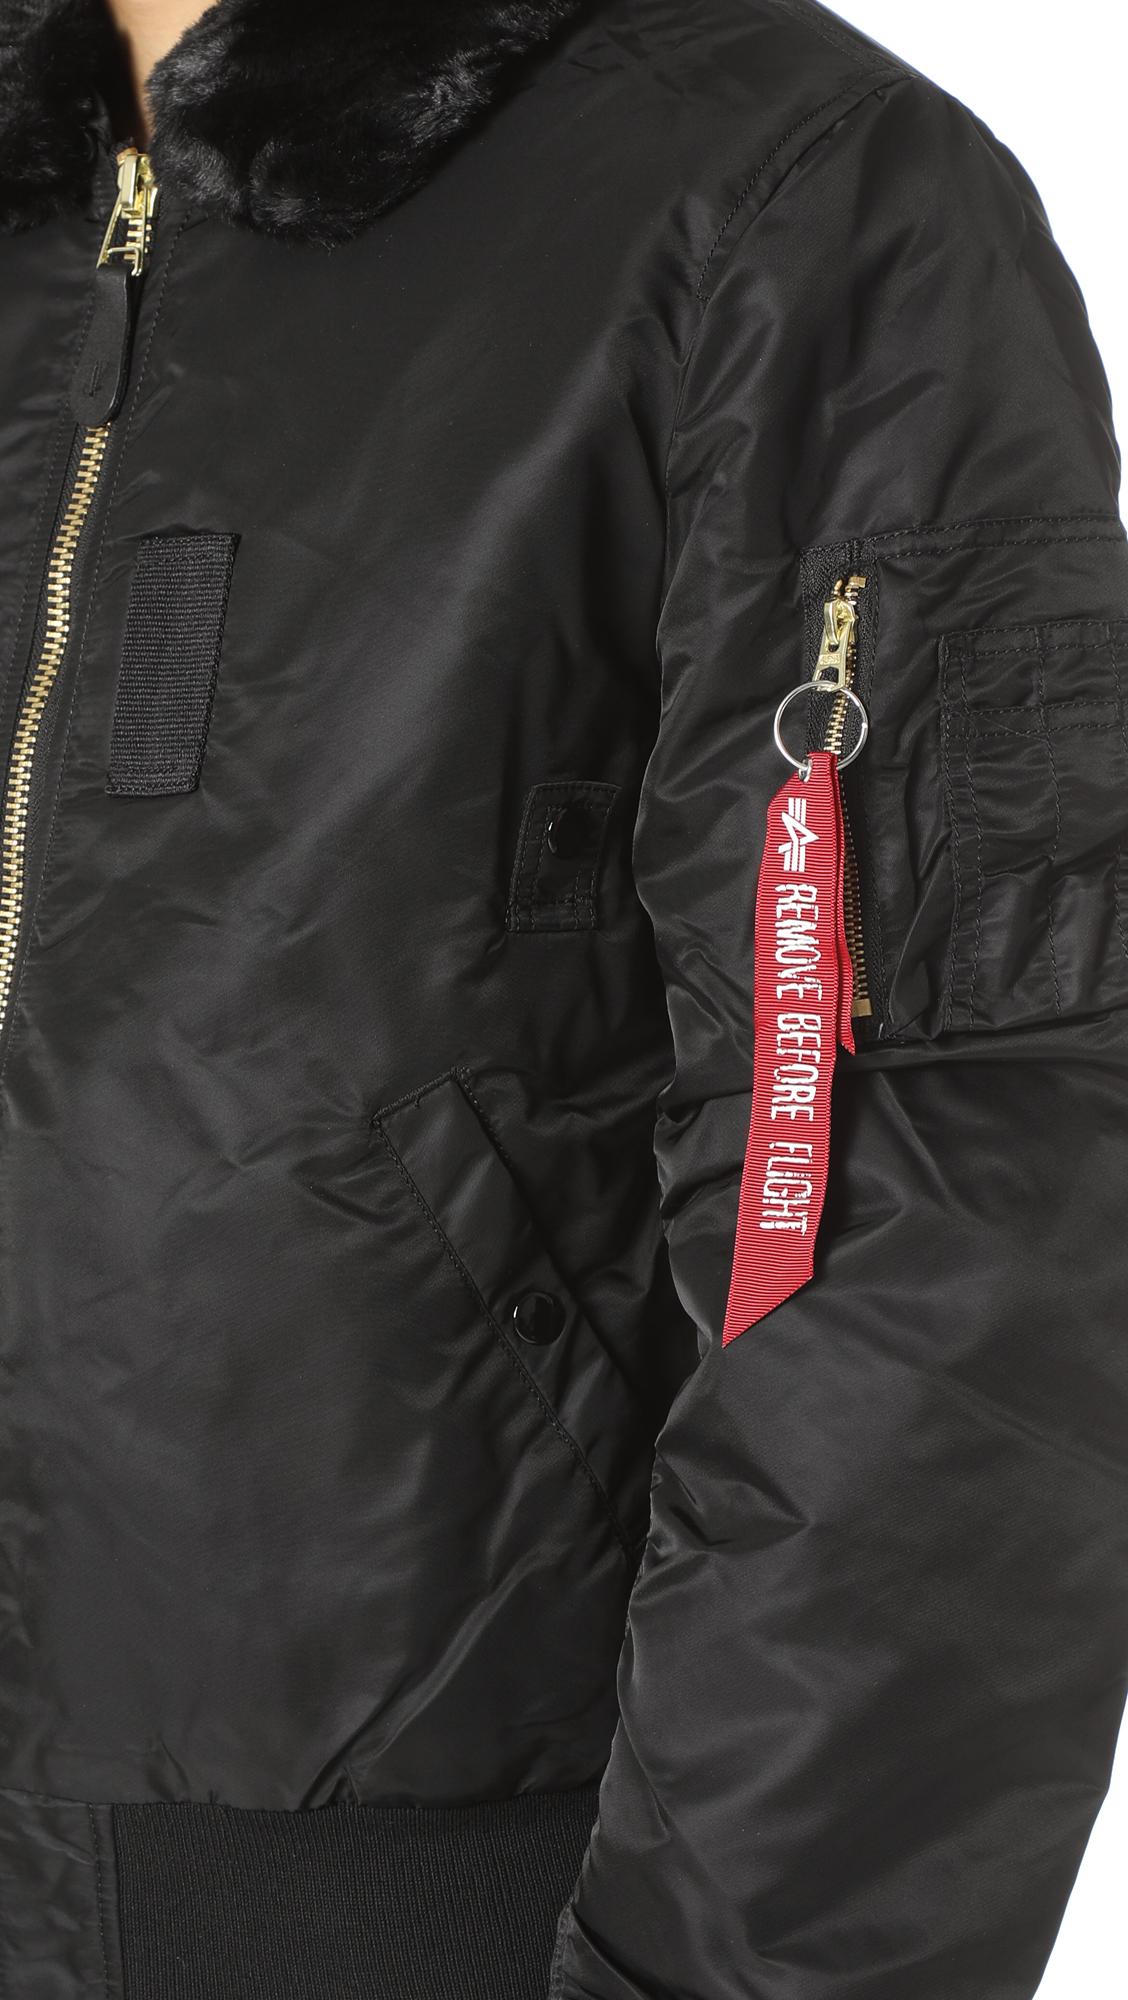 Alpha Industries B 15 Slim Fit Jacket East Dane Black Blazer Jaket Korea Style Sk